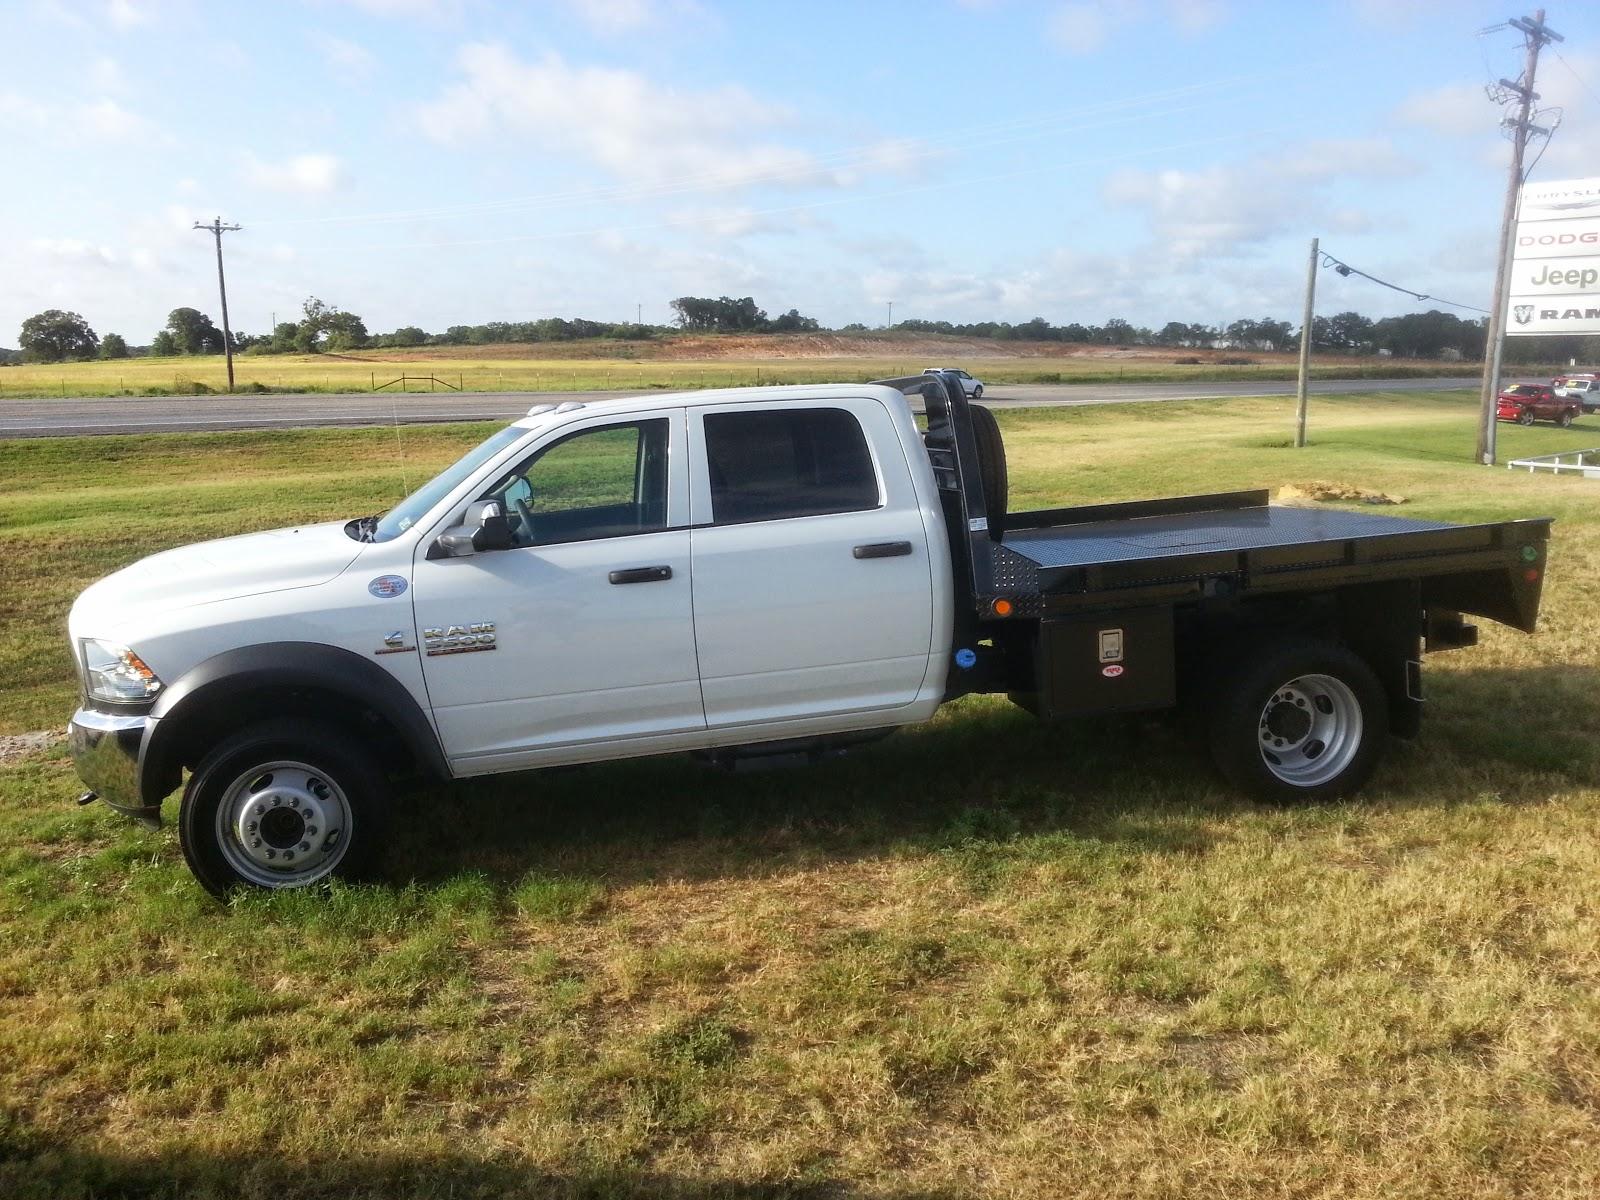 New 2014 ram 5500 flatbed 4x4 crew cab cummins diesel truck with aisin transmission